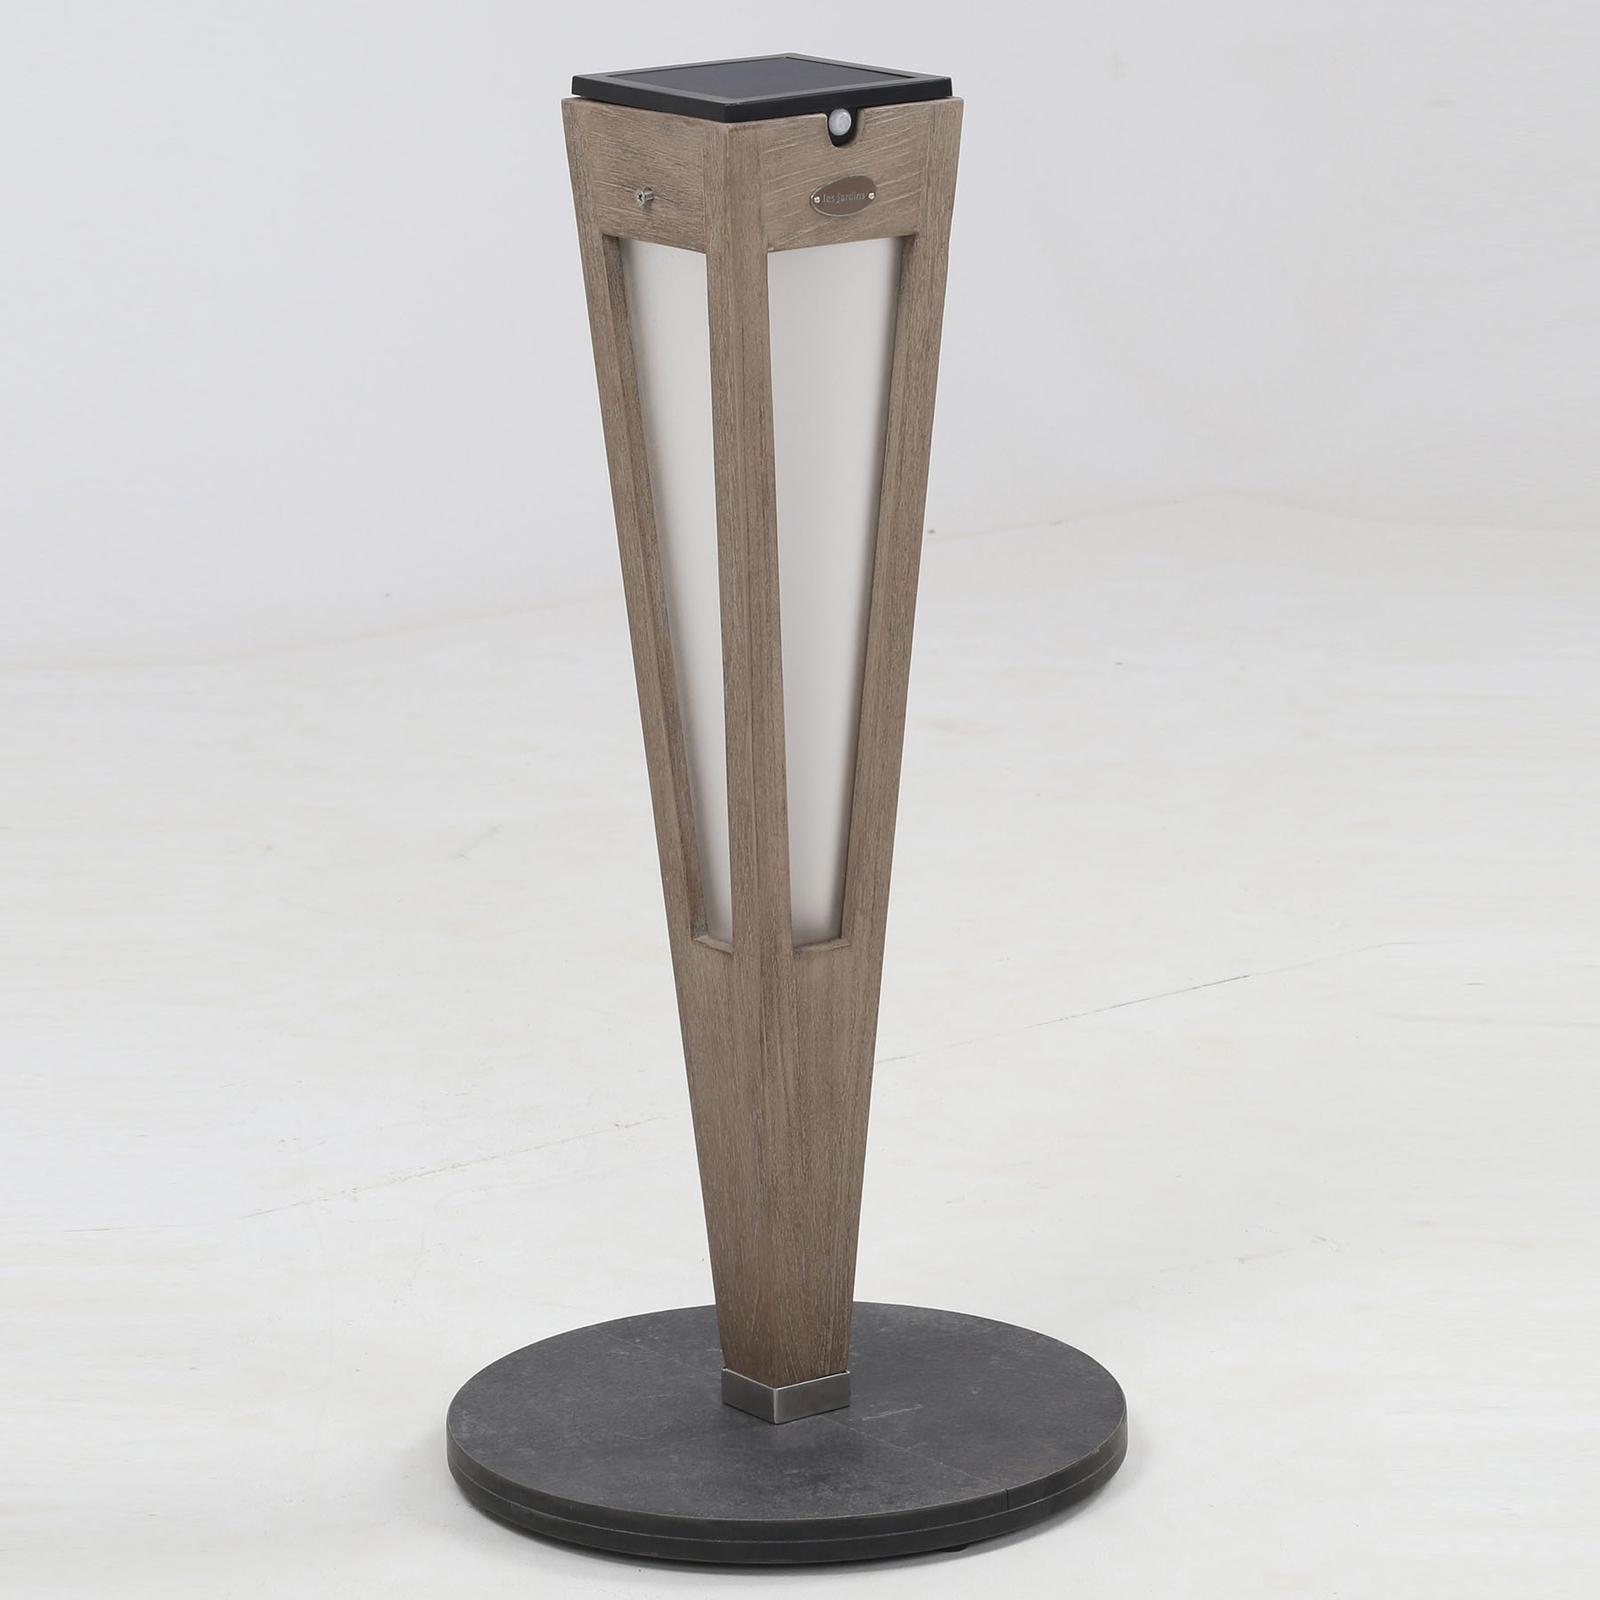 LED-Solarfackel Tecka mit Sensor, 52 cm, Duratek